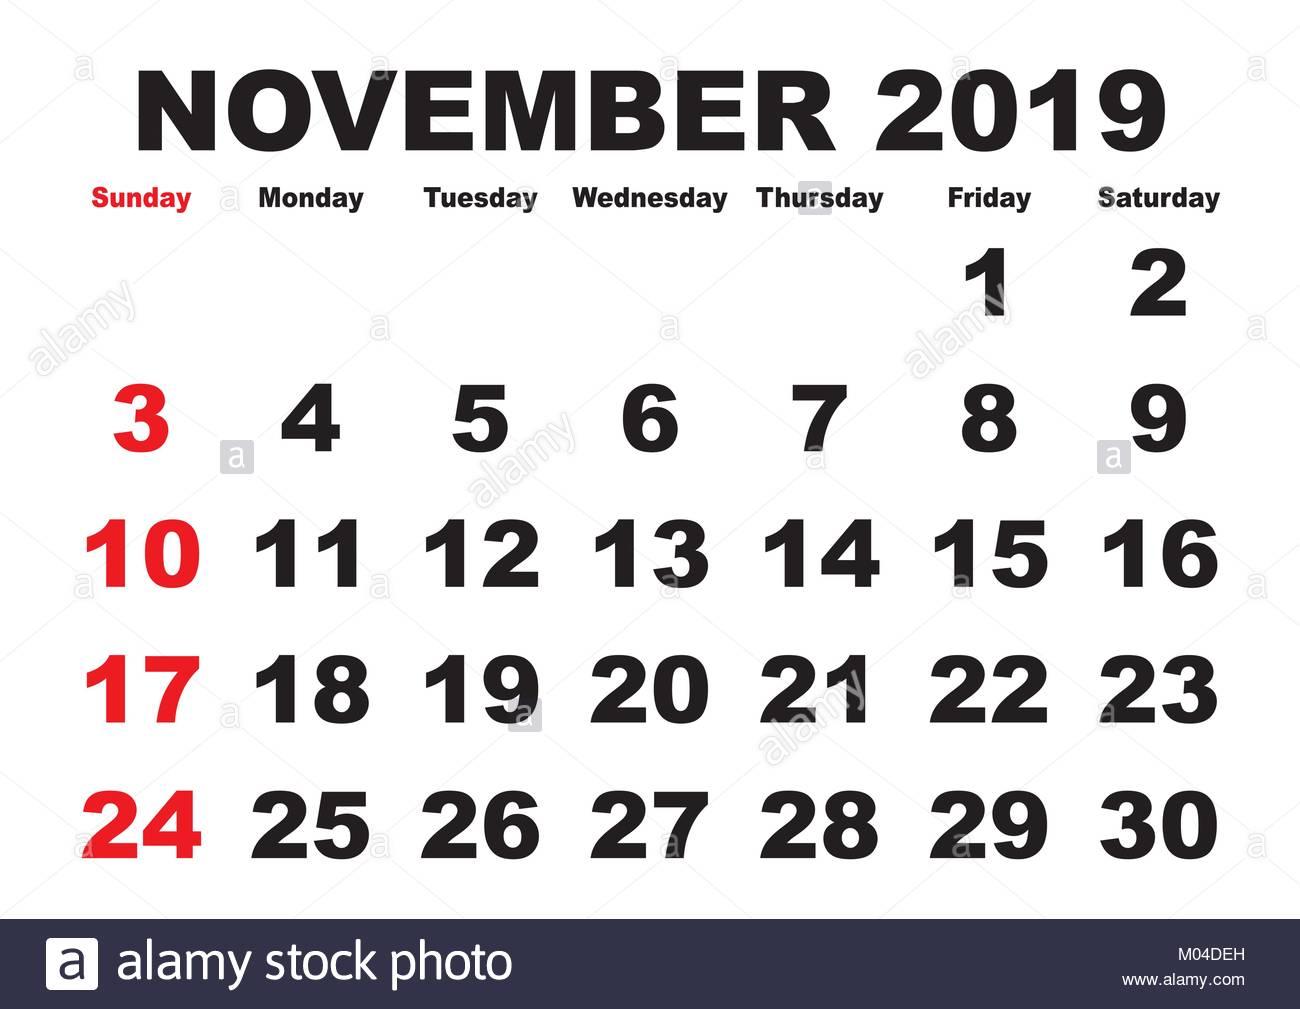 blank calendar template november 2019